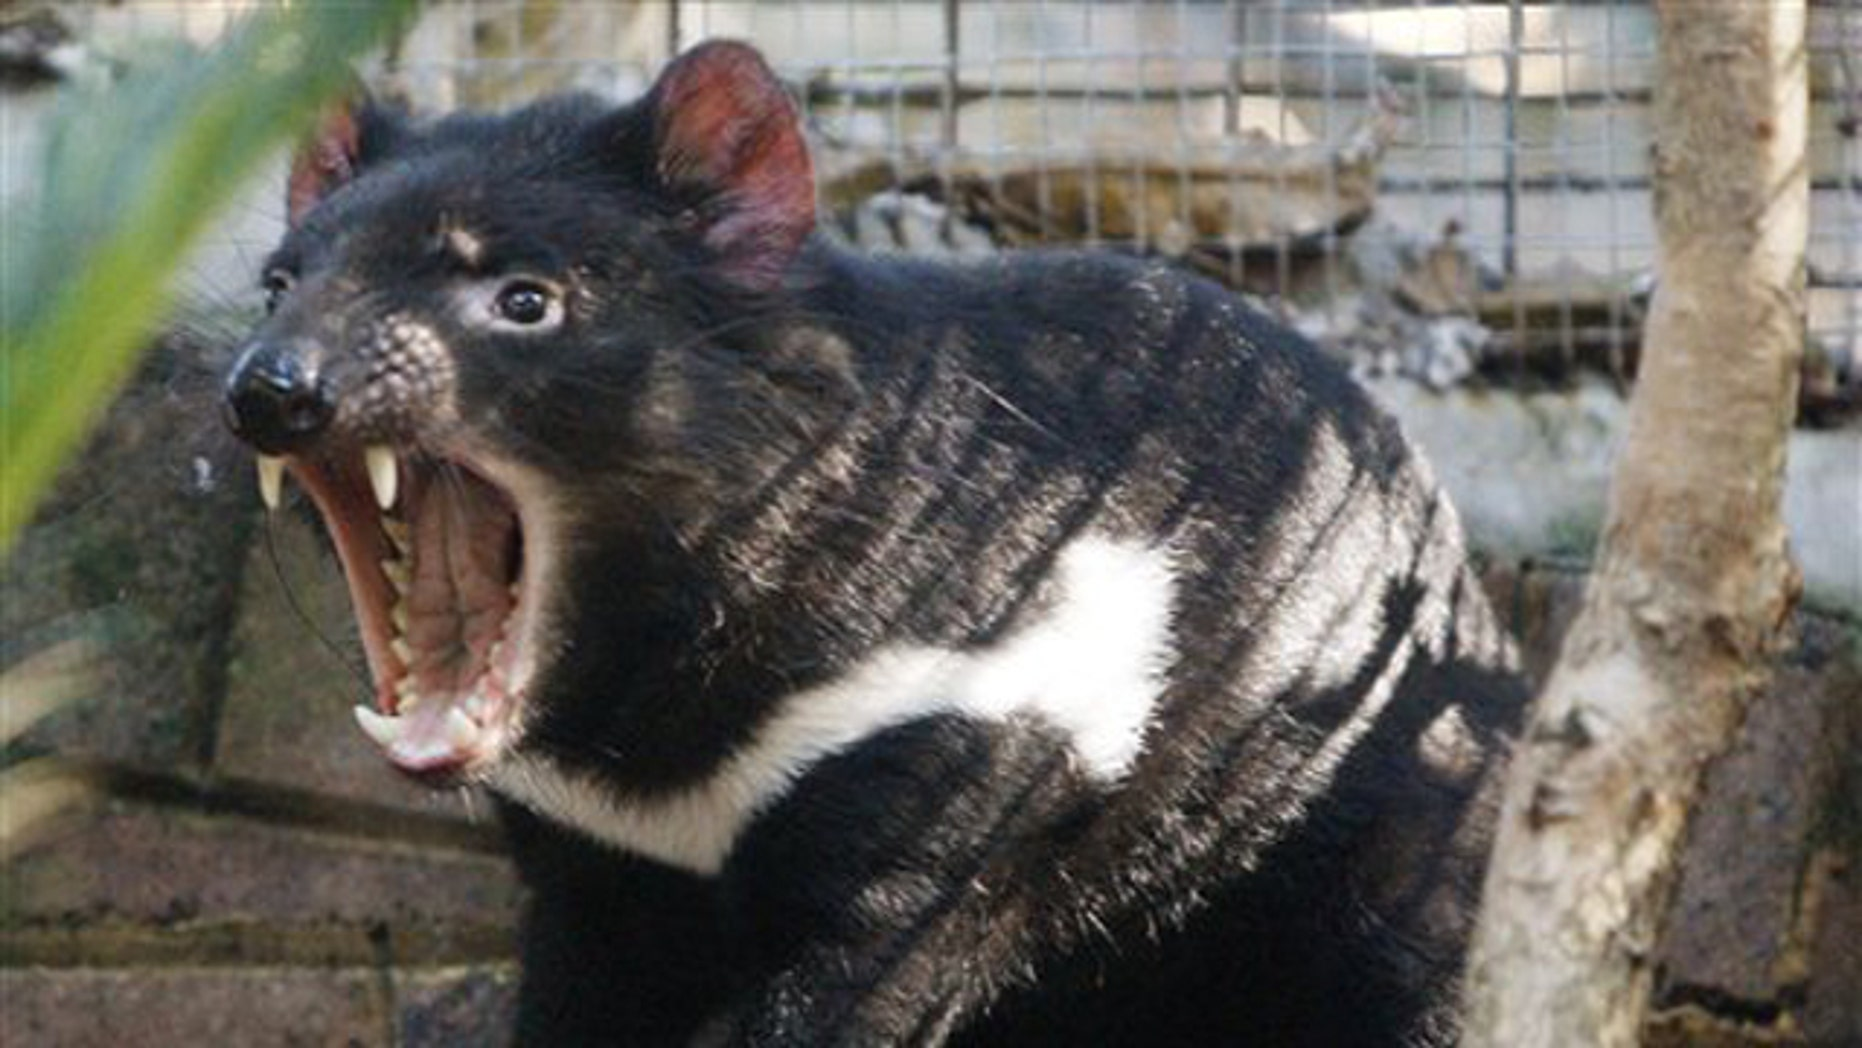 A Tasmanian devil sits in his enclosure at Sydney's Taronga Zoo.